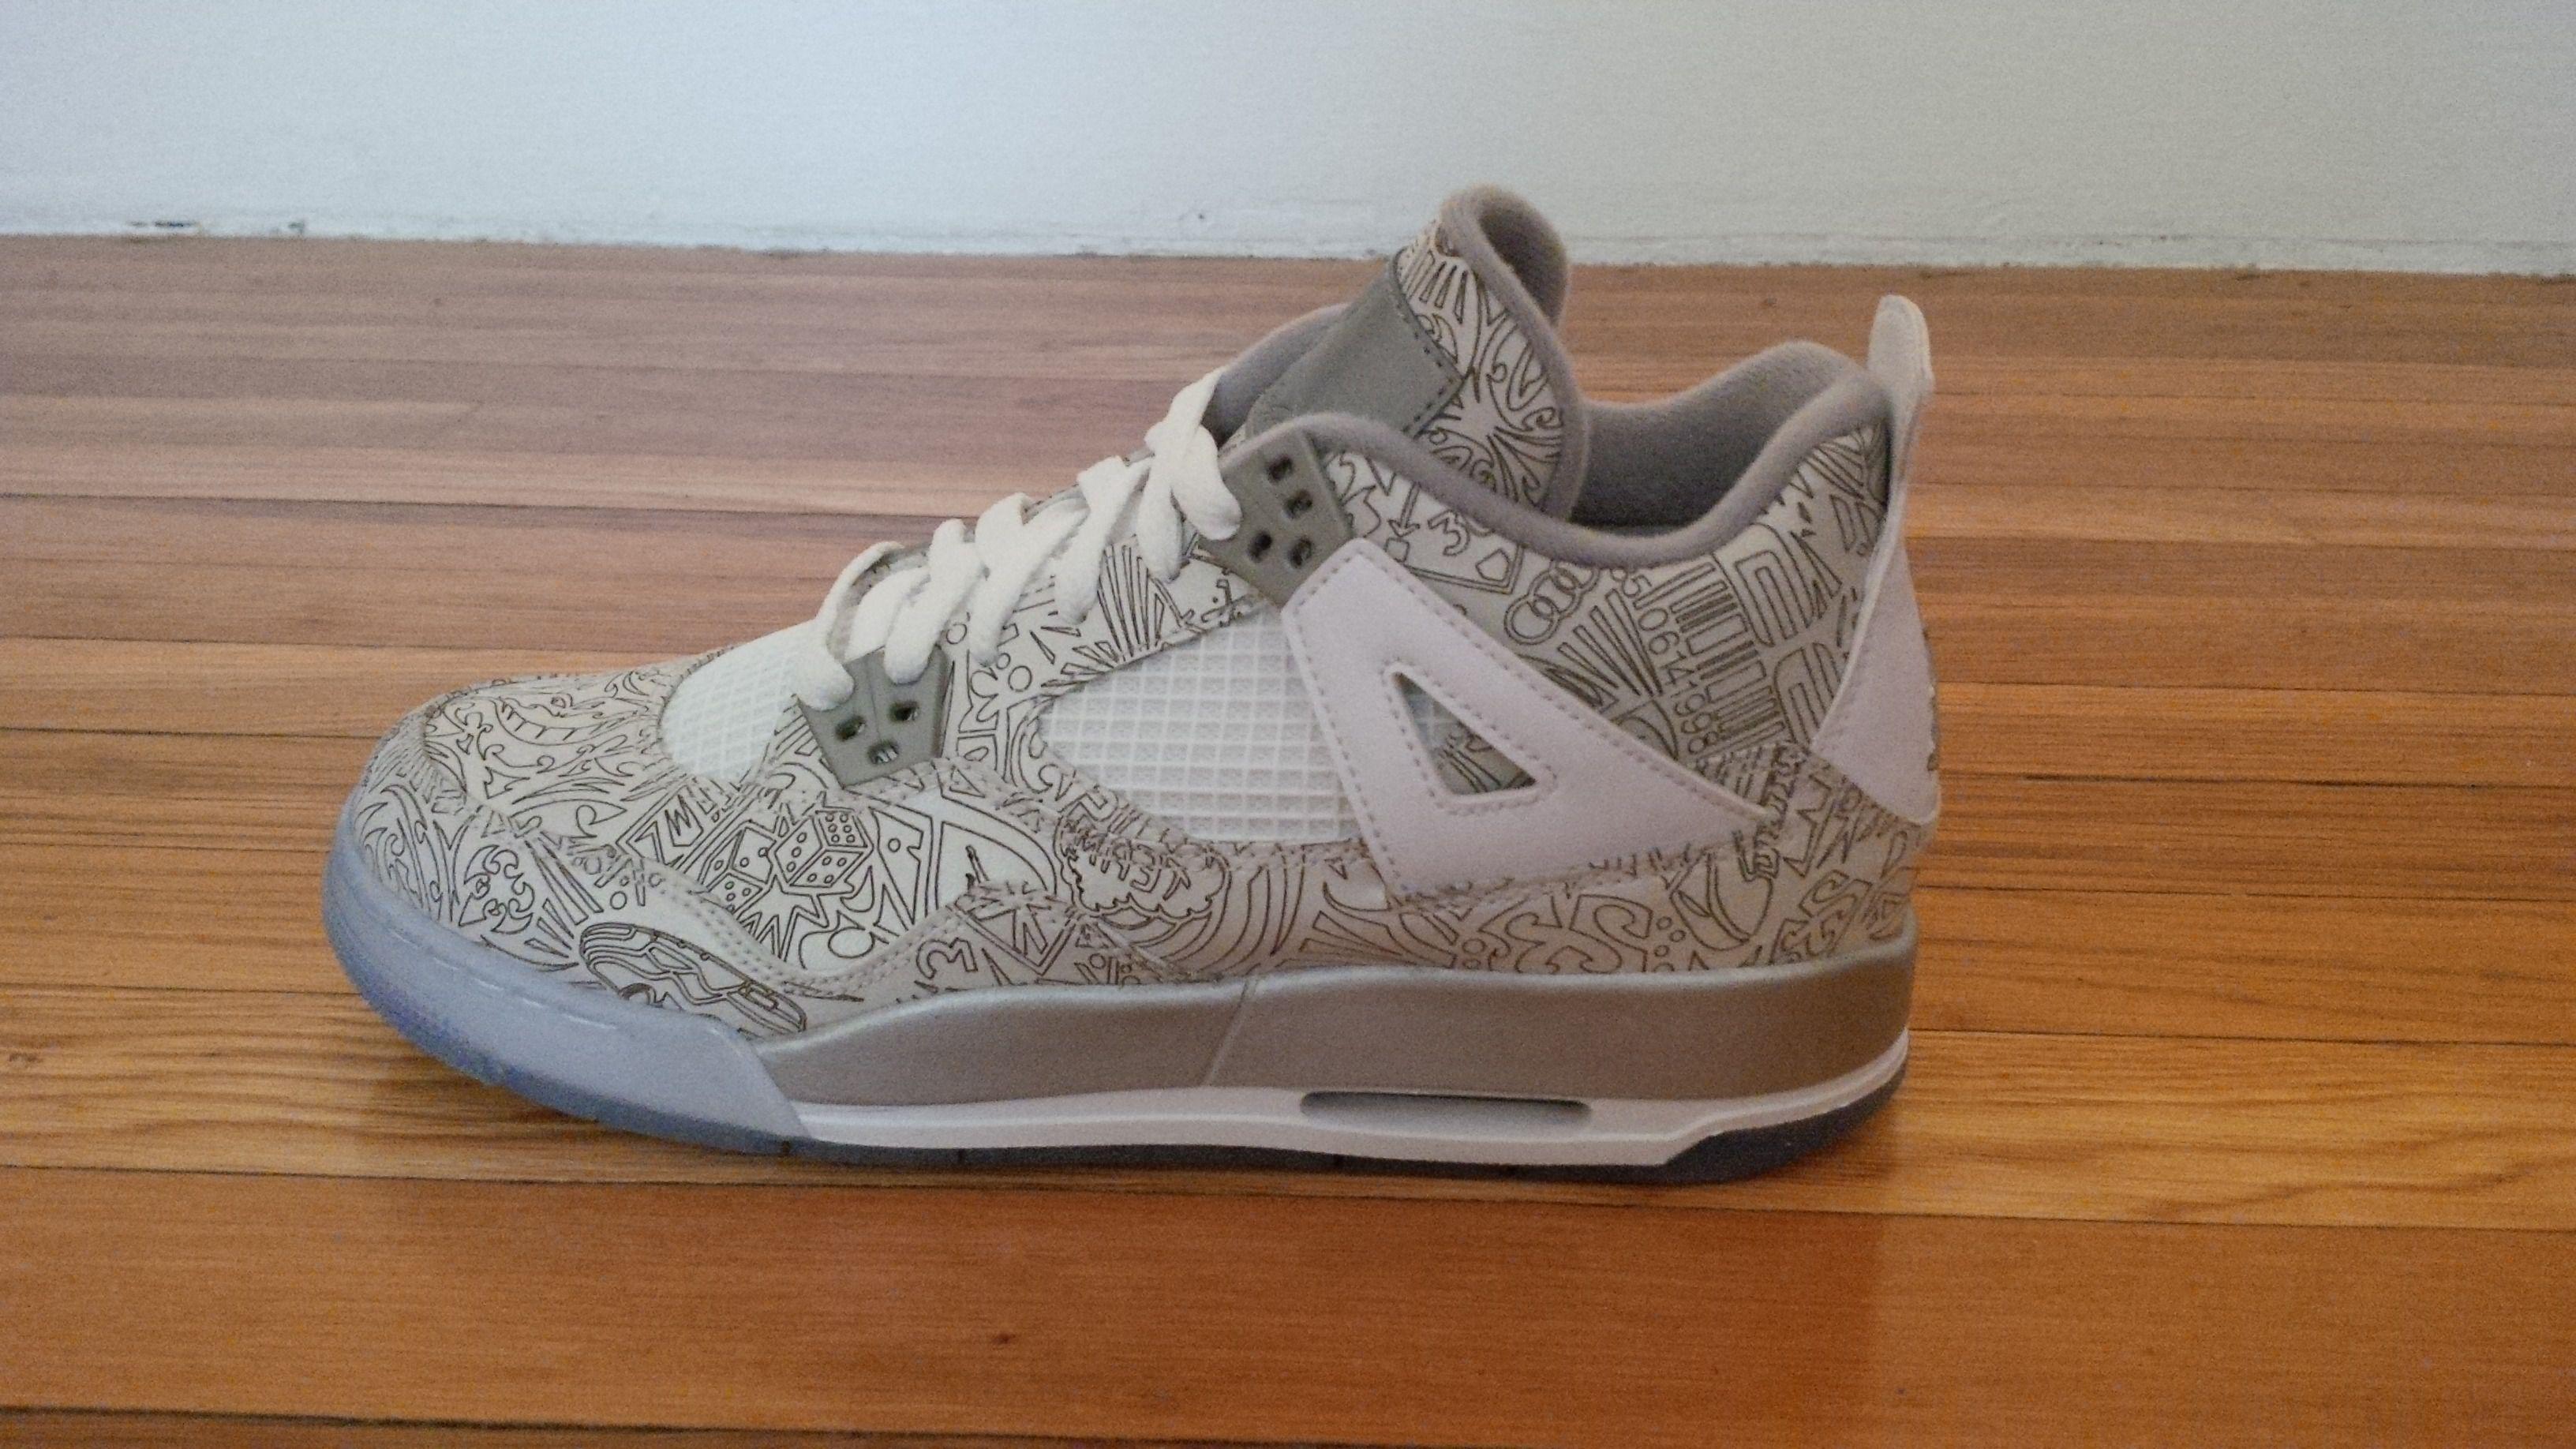 Come List Sneakers For Free Jordan Retro Iv Laser Bg